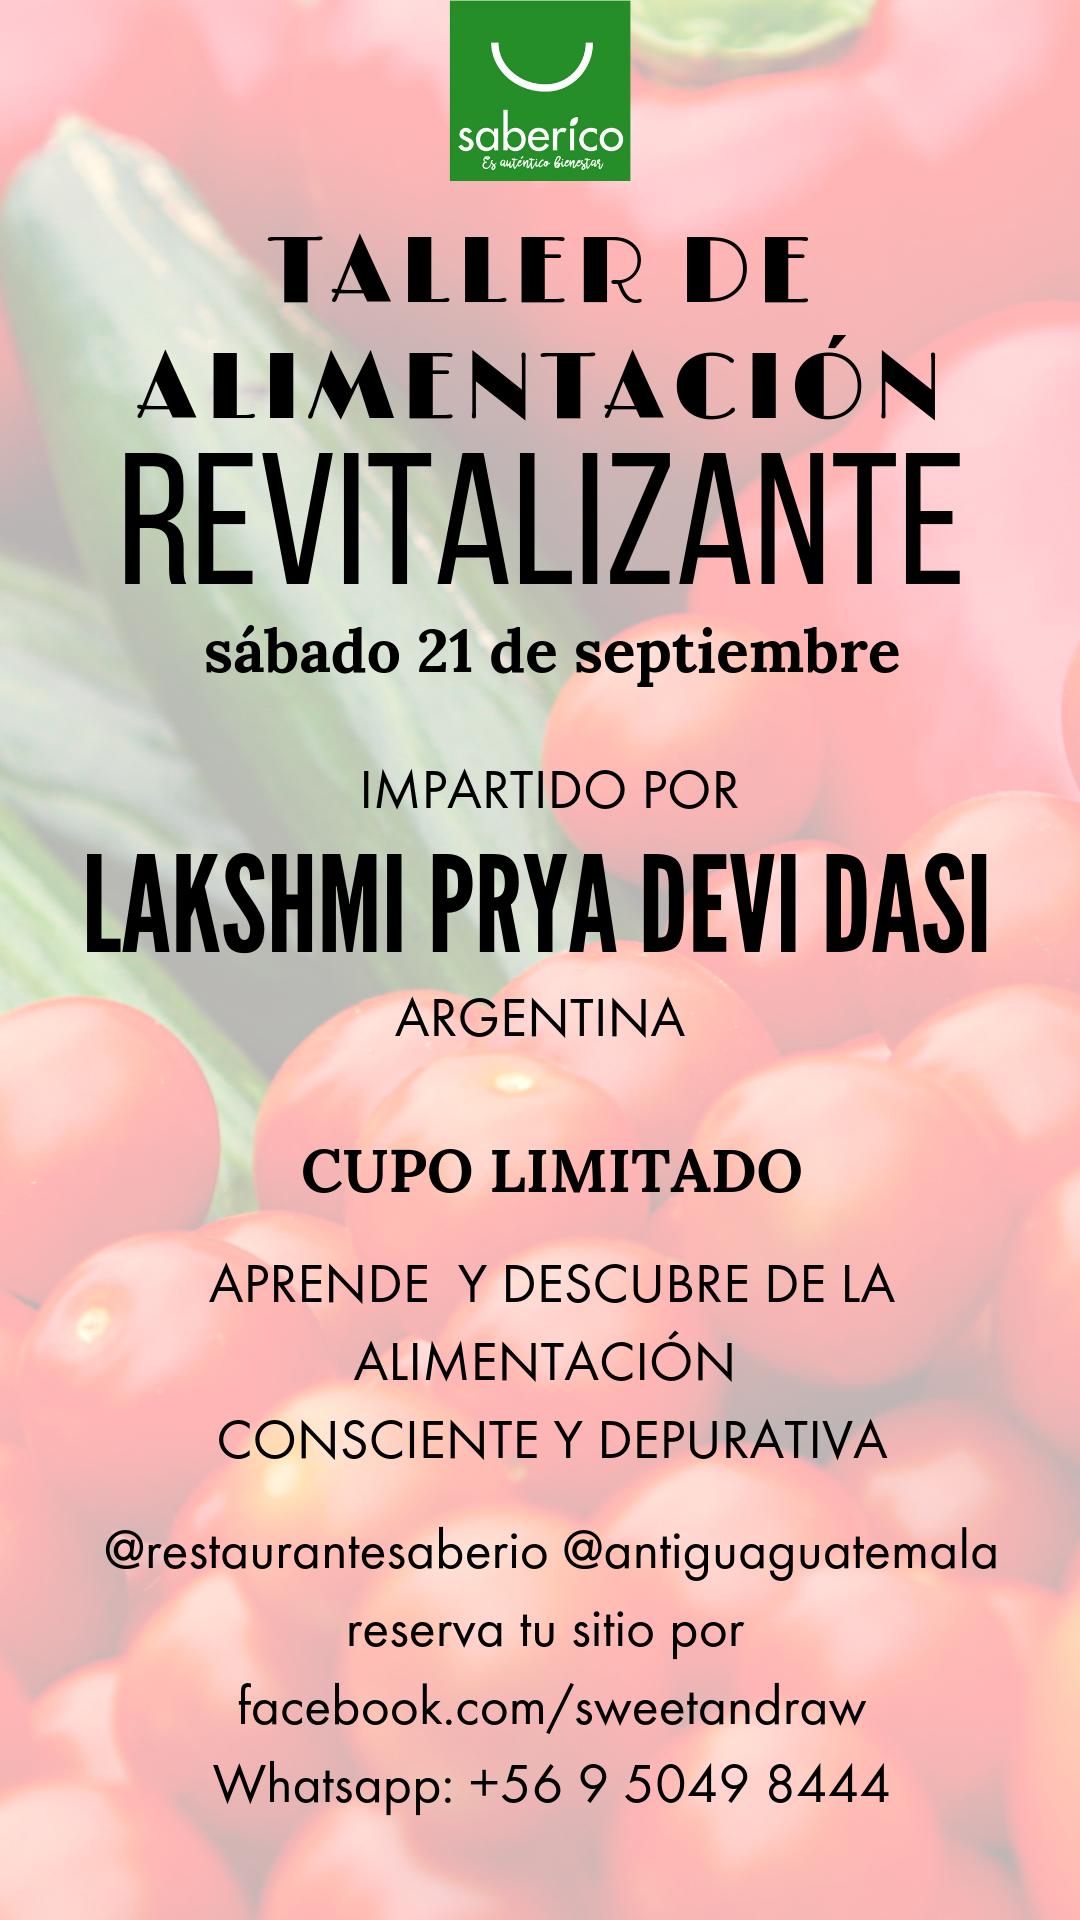 taller-alimentación-revitalizante-saberico-alimentacion-consciente-guatemala.png